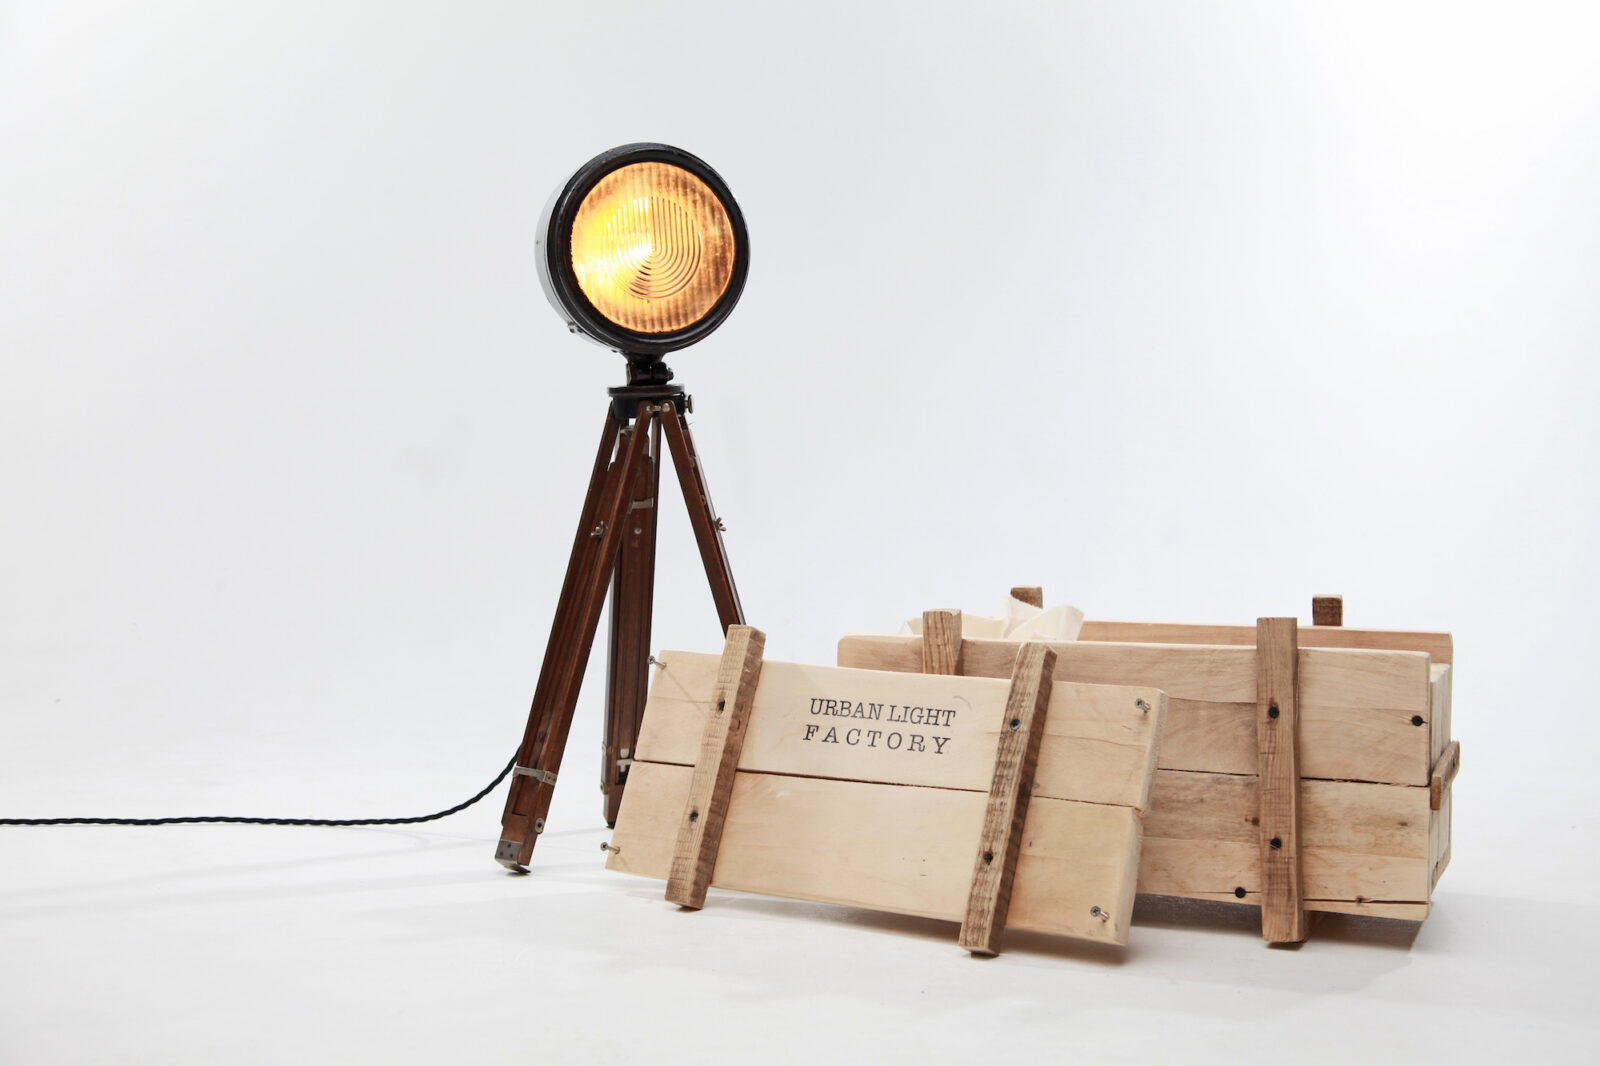 Urban Light Factory 2 1600x1066 - Otto Lamp by Urban Light Factory